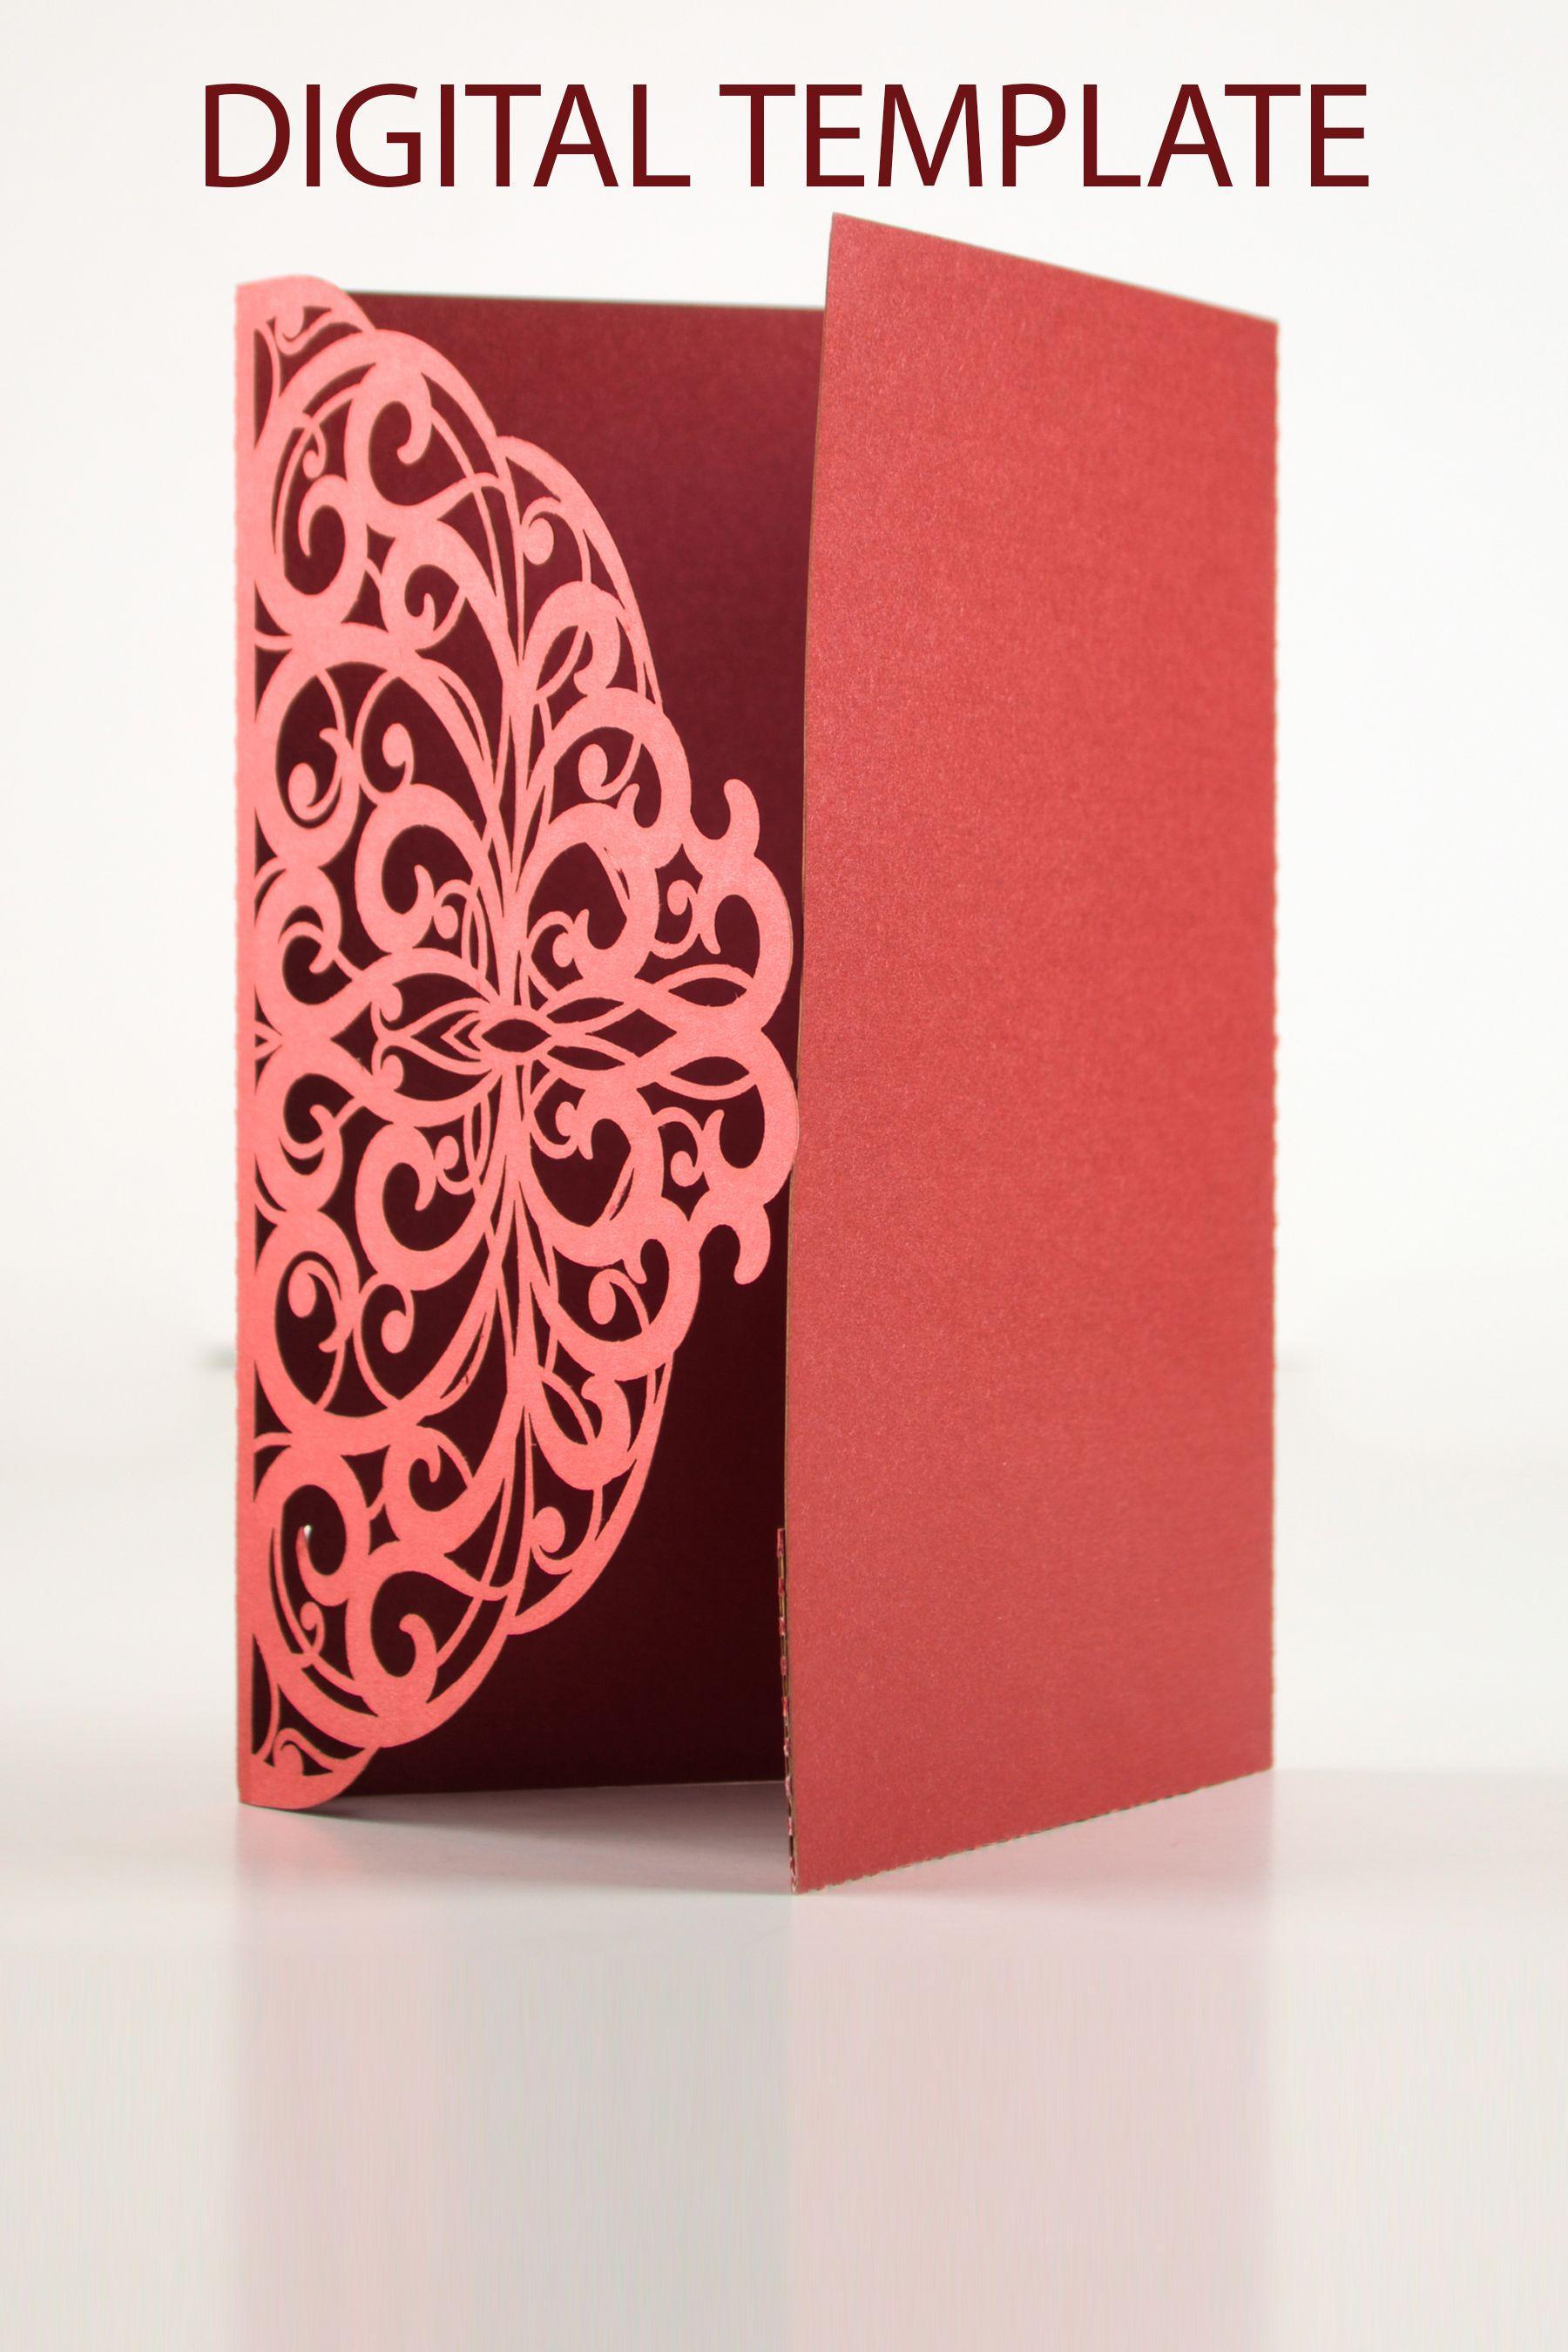 5×7 Pocket Fold Invitation Template